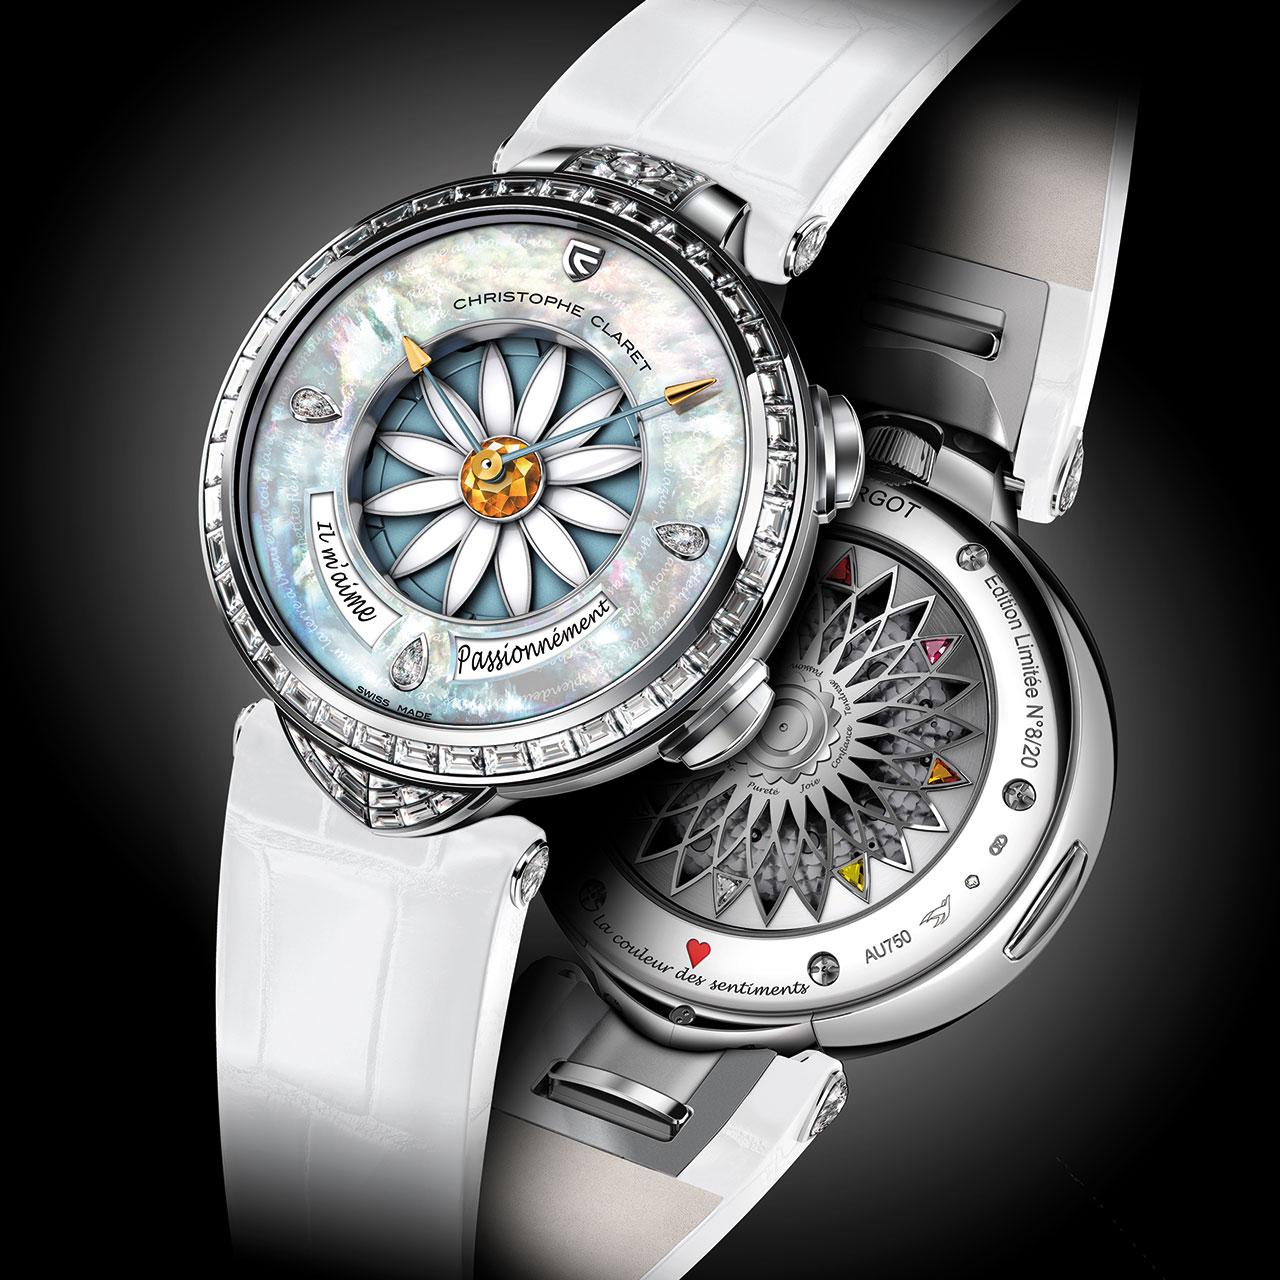 Christophe Claret Margot Automatic Watch